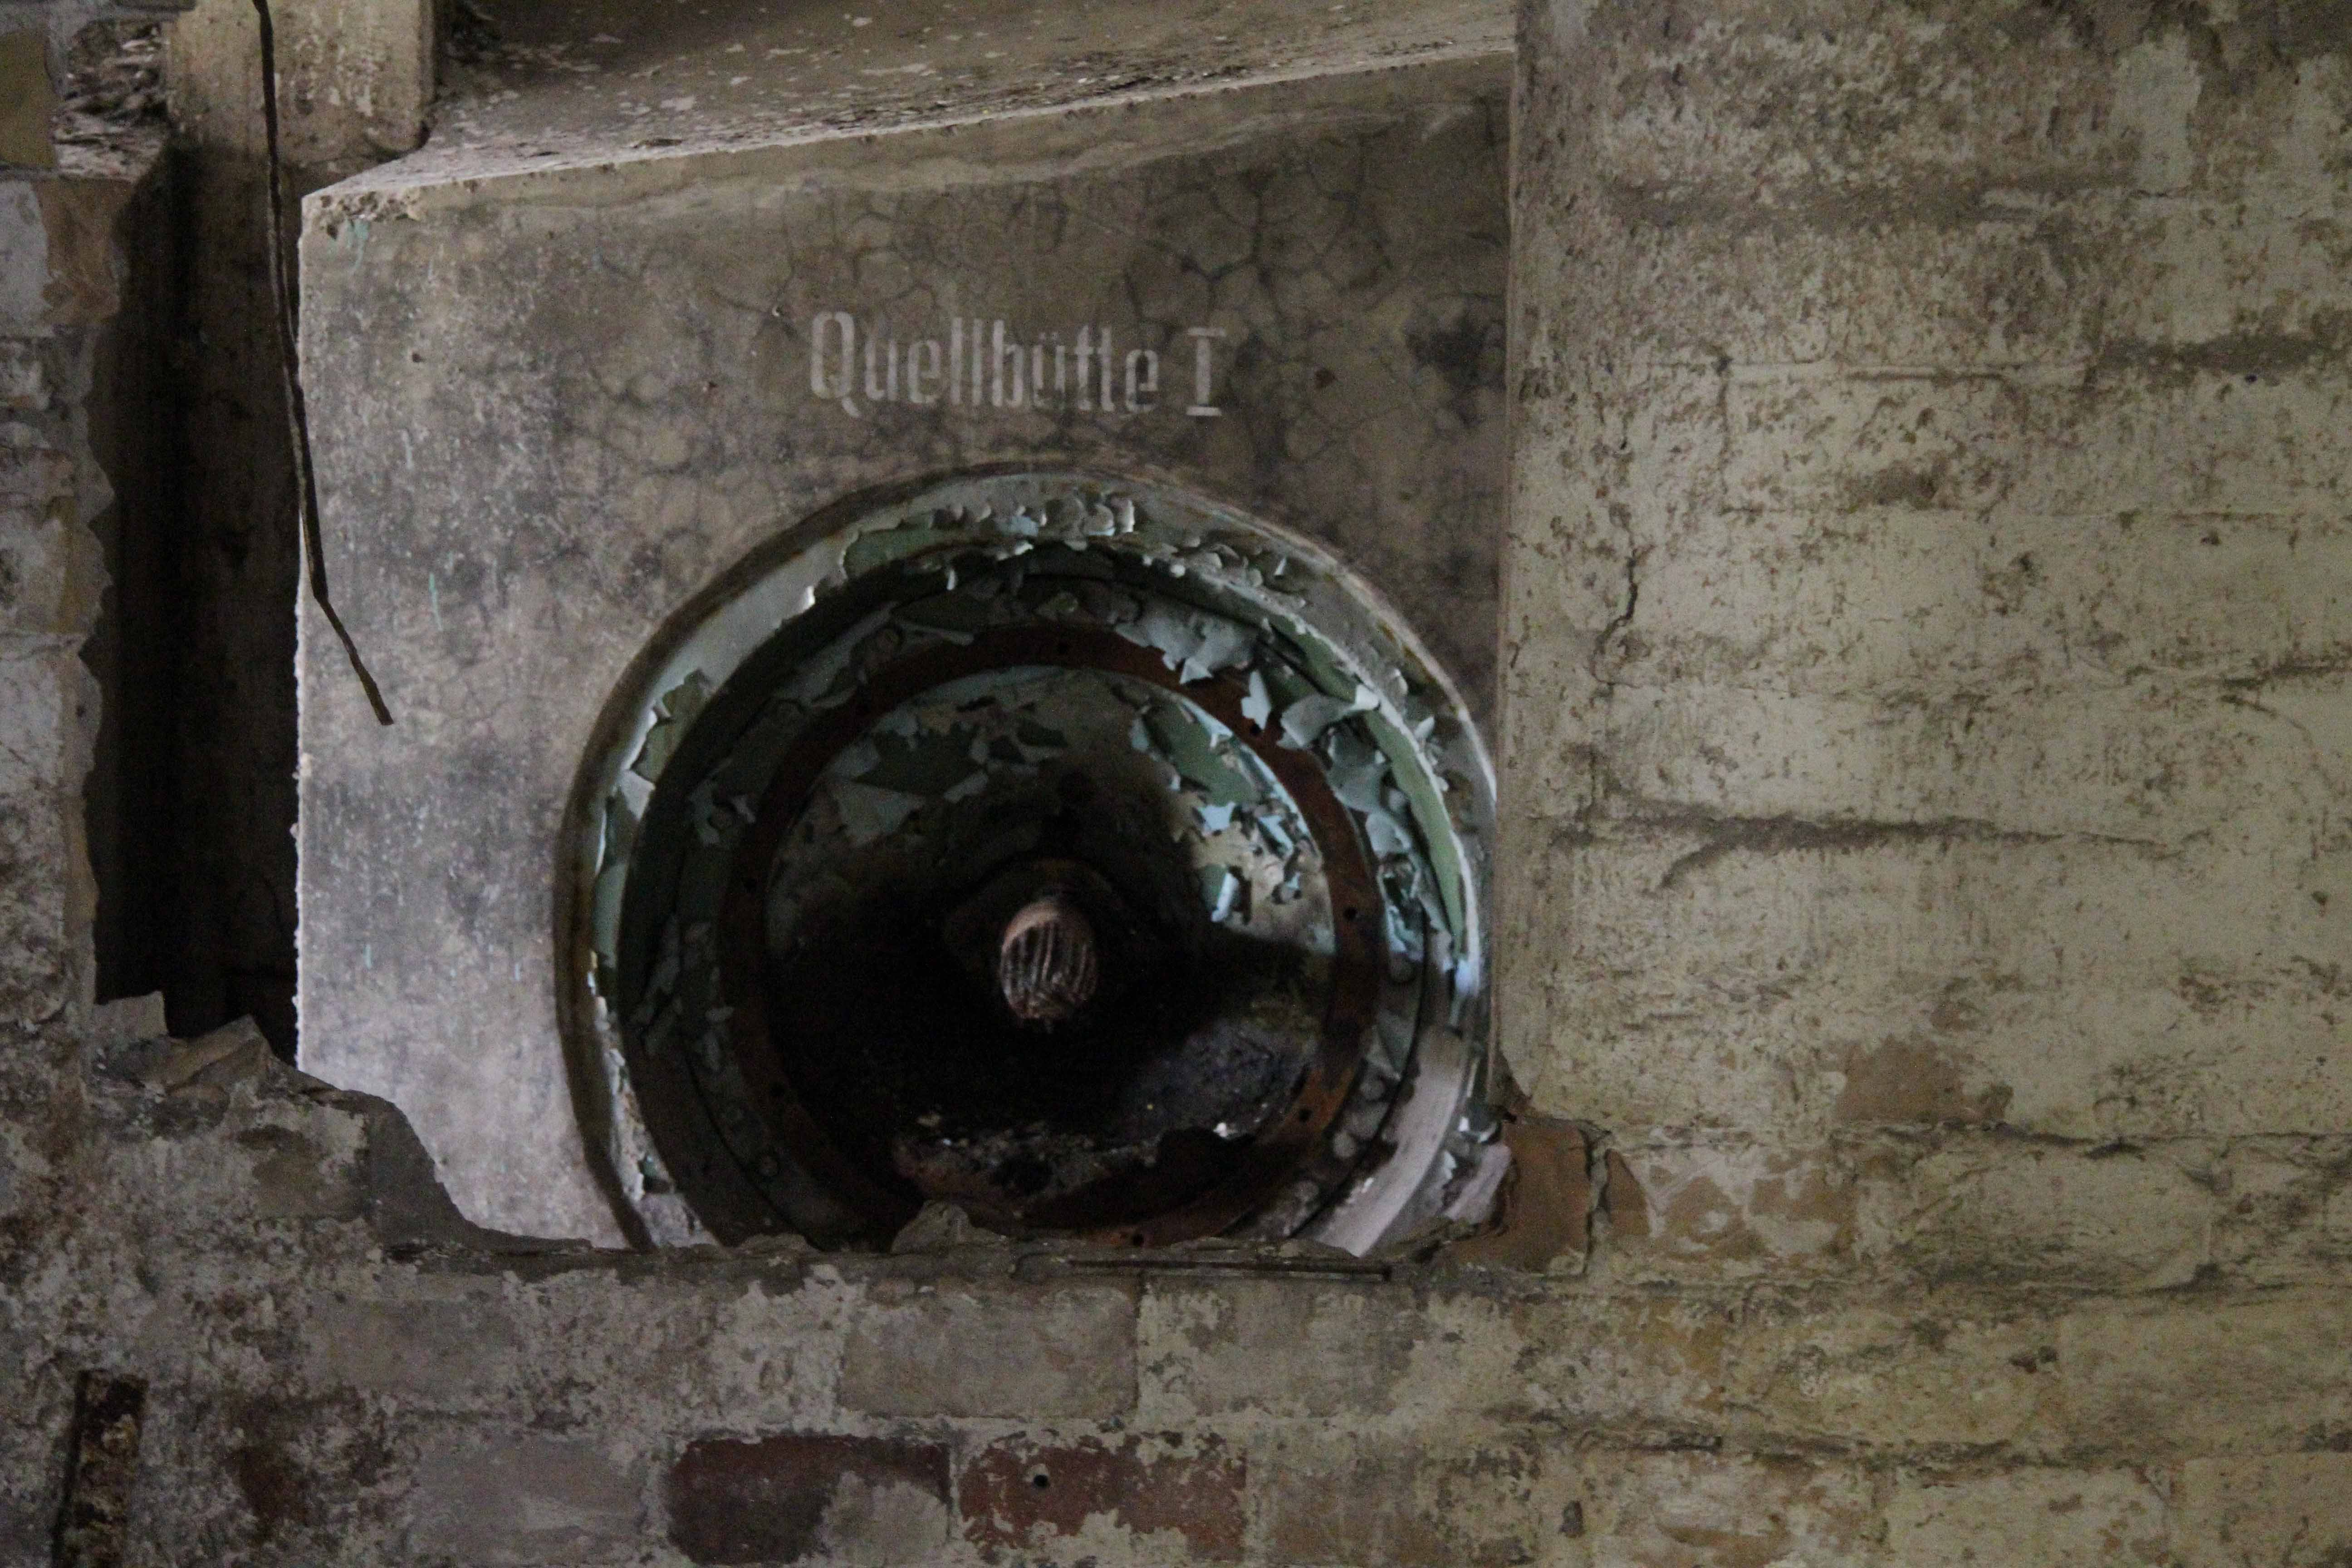 Quellbütte at Papierfabrik Wolfswinkel, an abandoned paper mill near Berlin